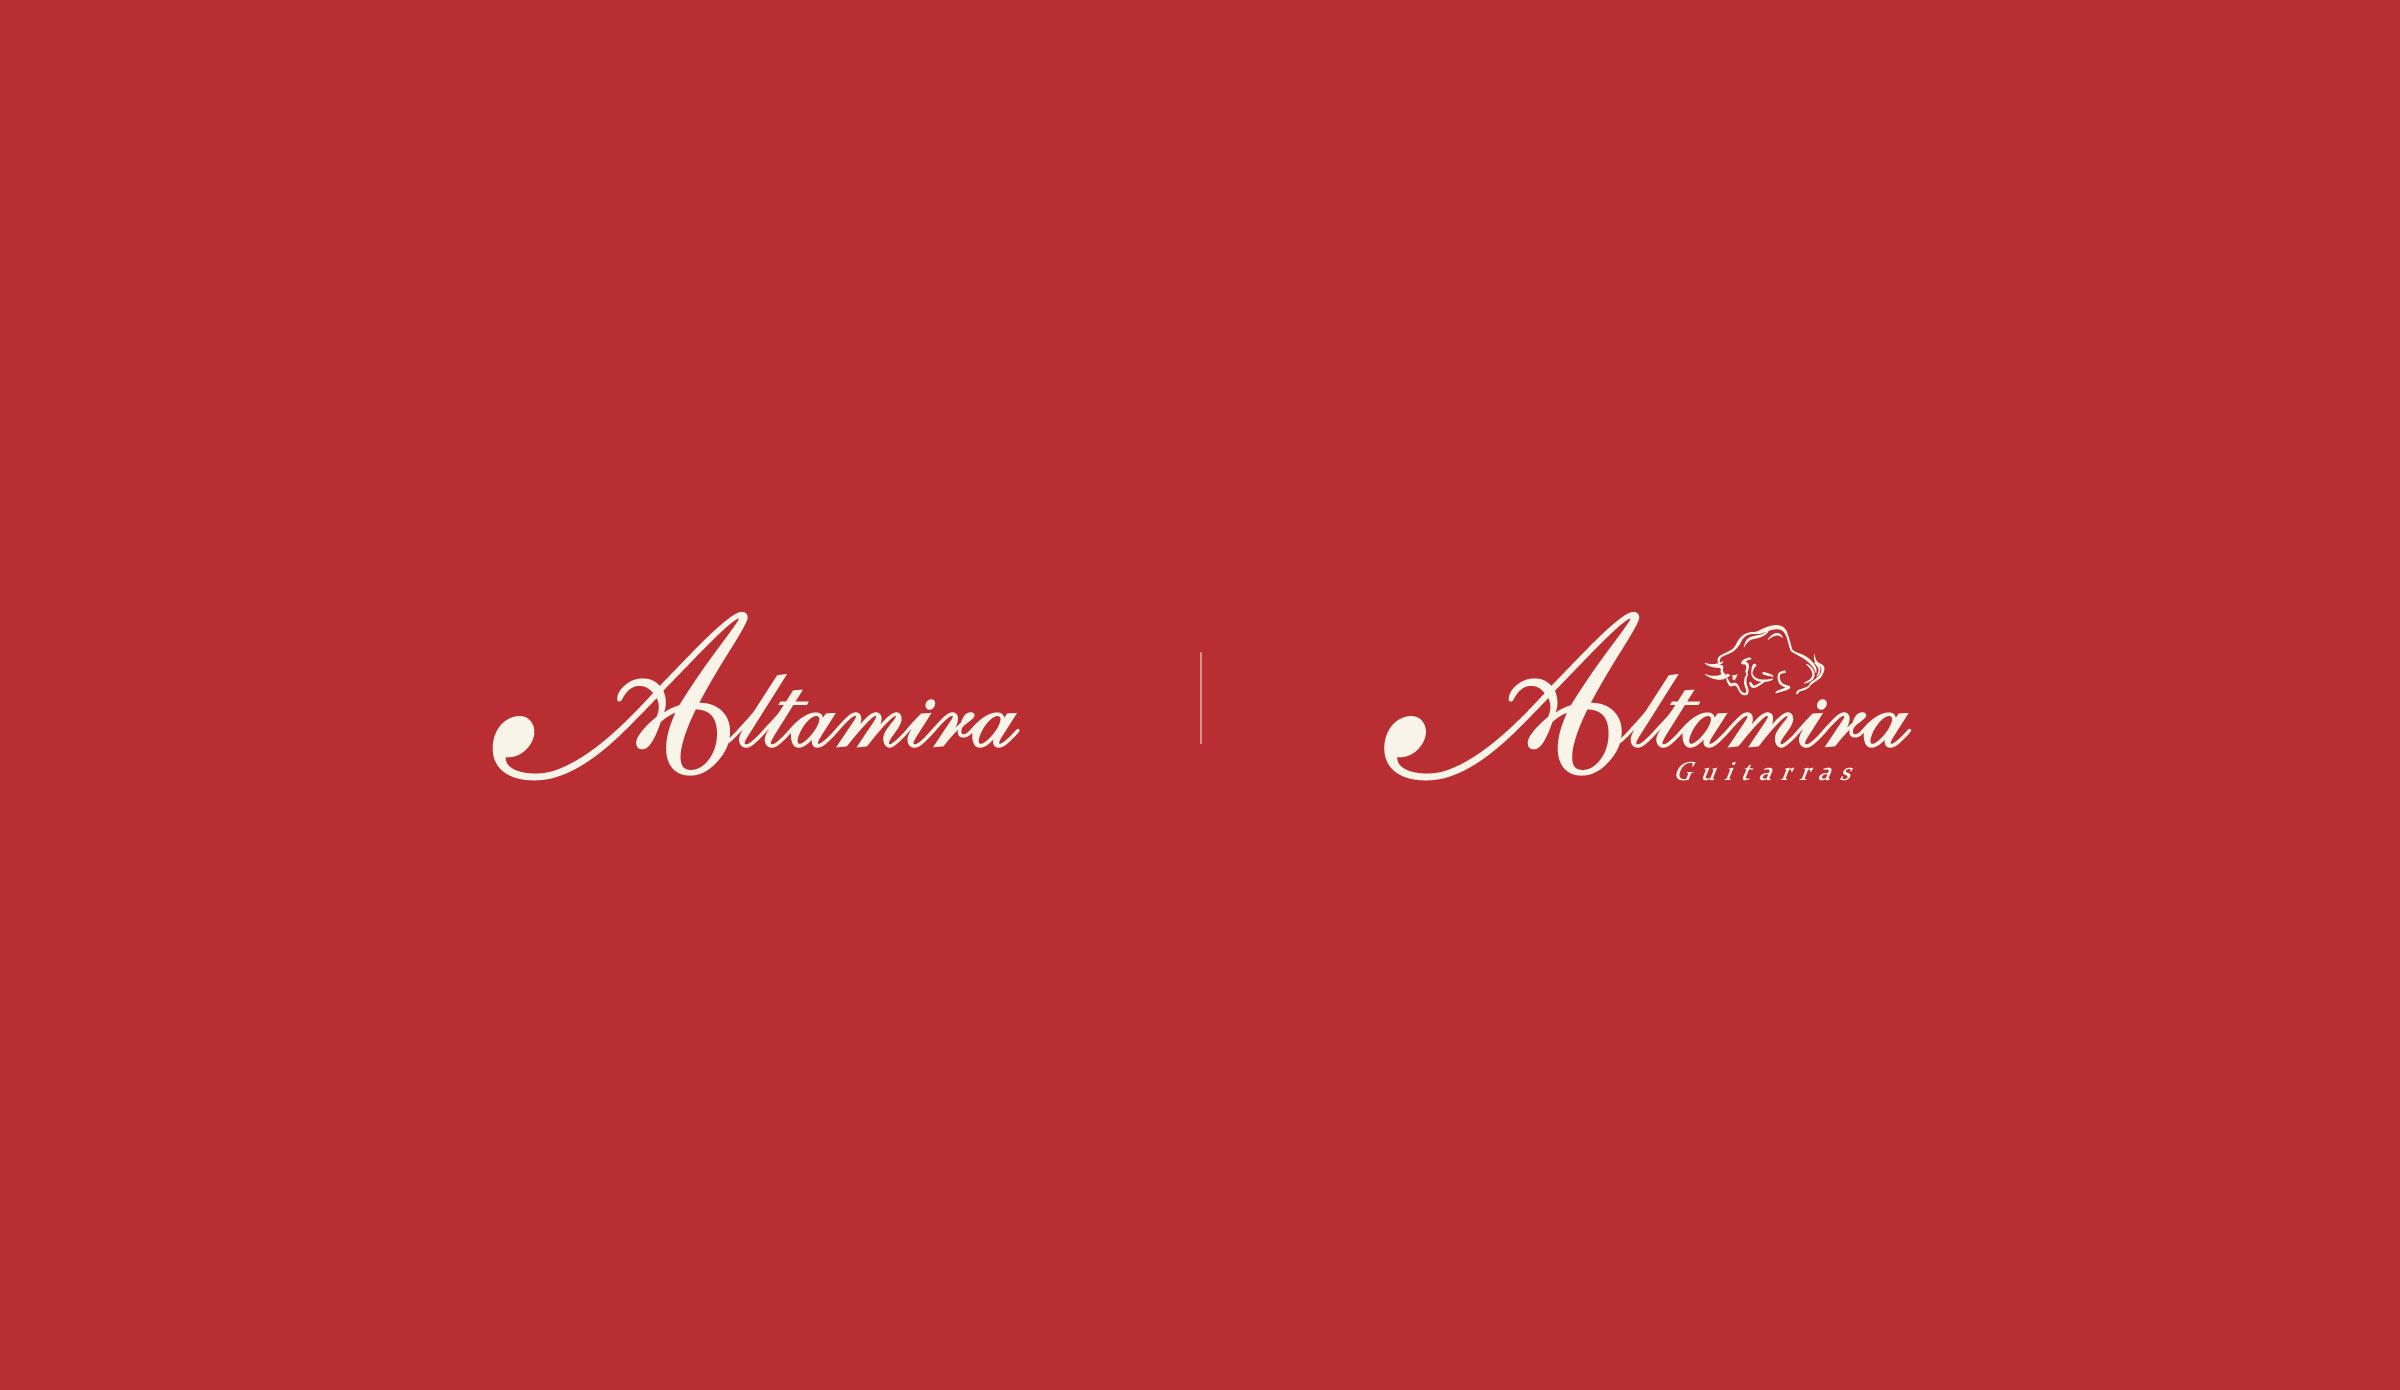 FET_Altamira-BrandRed